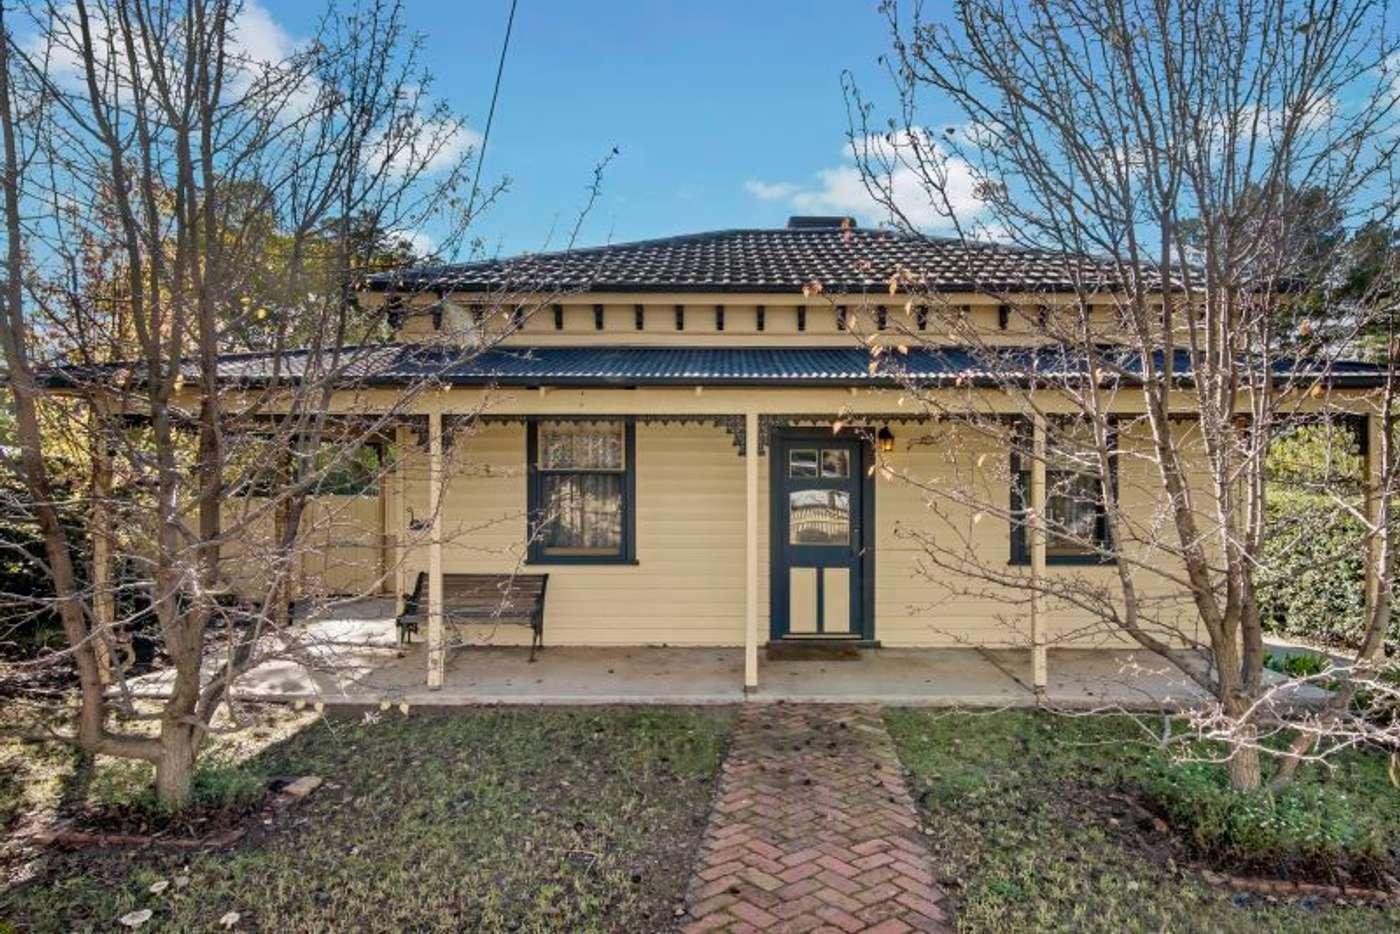 Main view of Homely house listing, 10 Flood Street, Bendigo VIC 3550